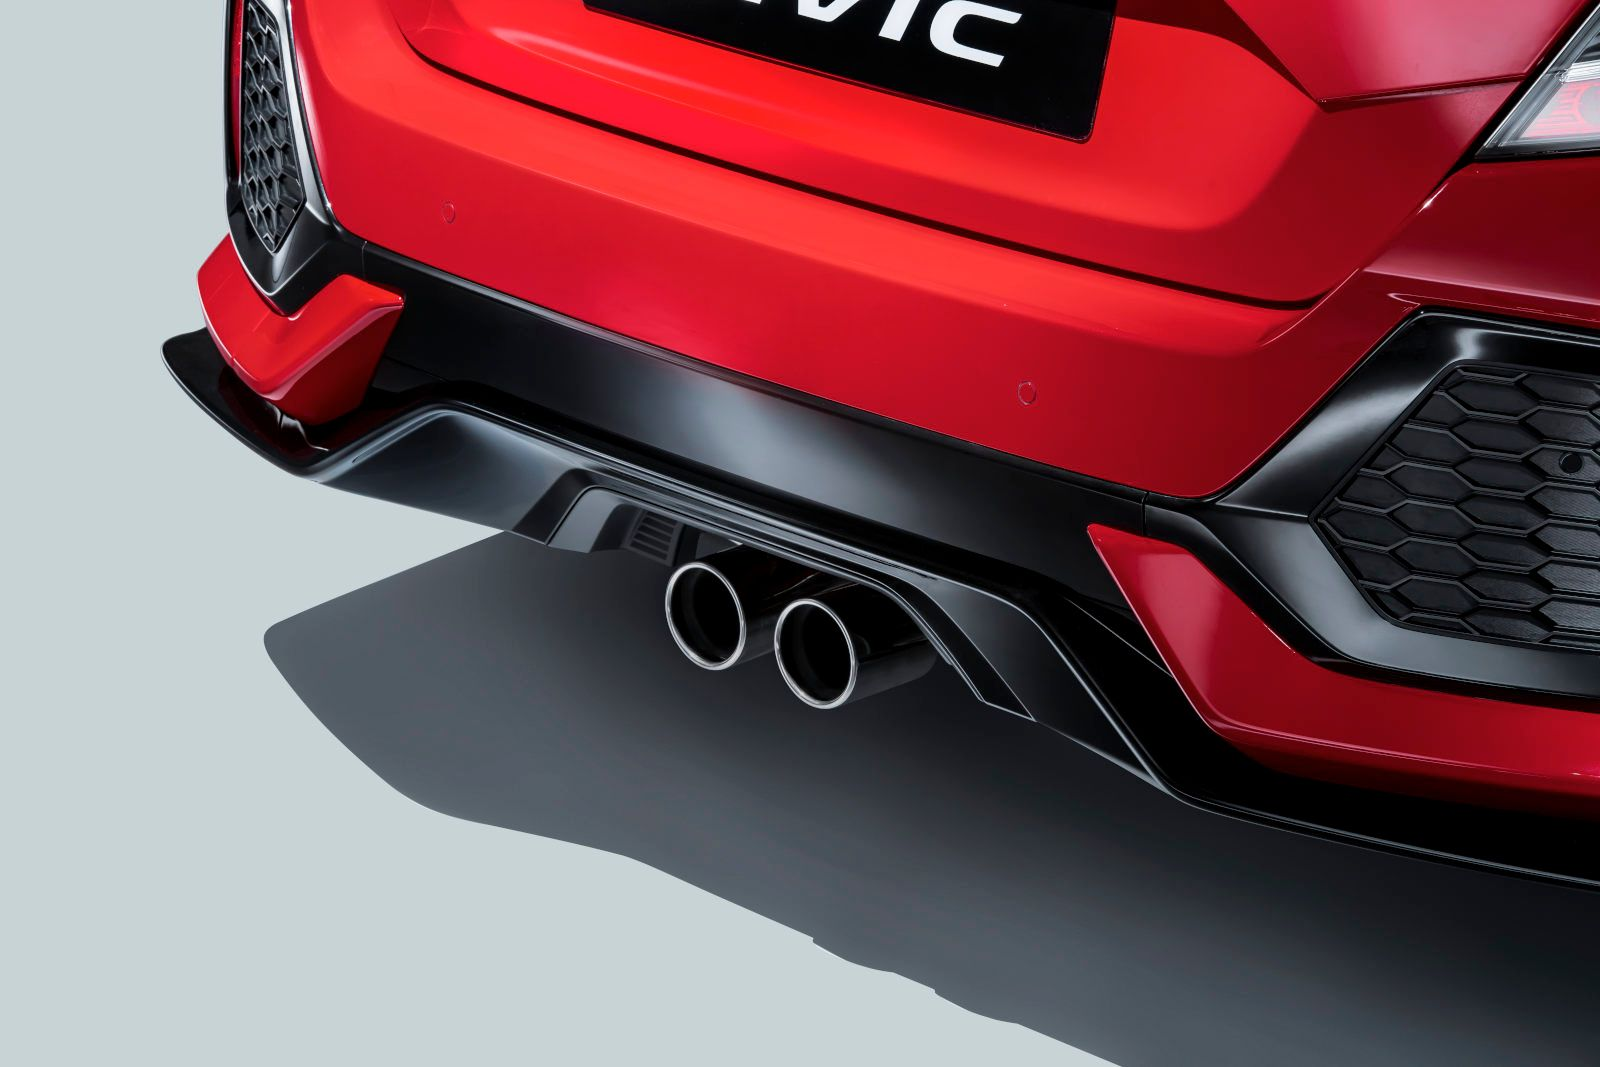 new-civic-hatchback-108_01